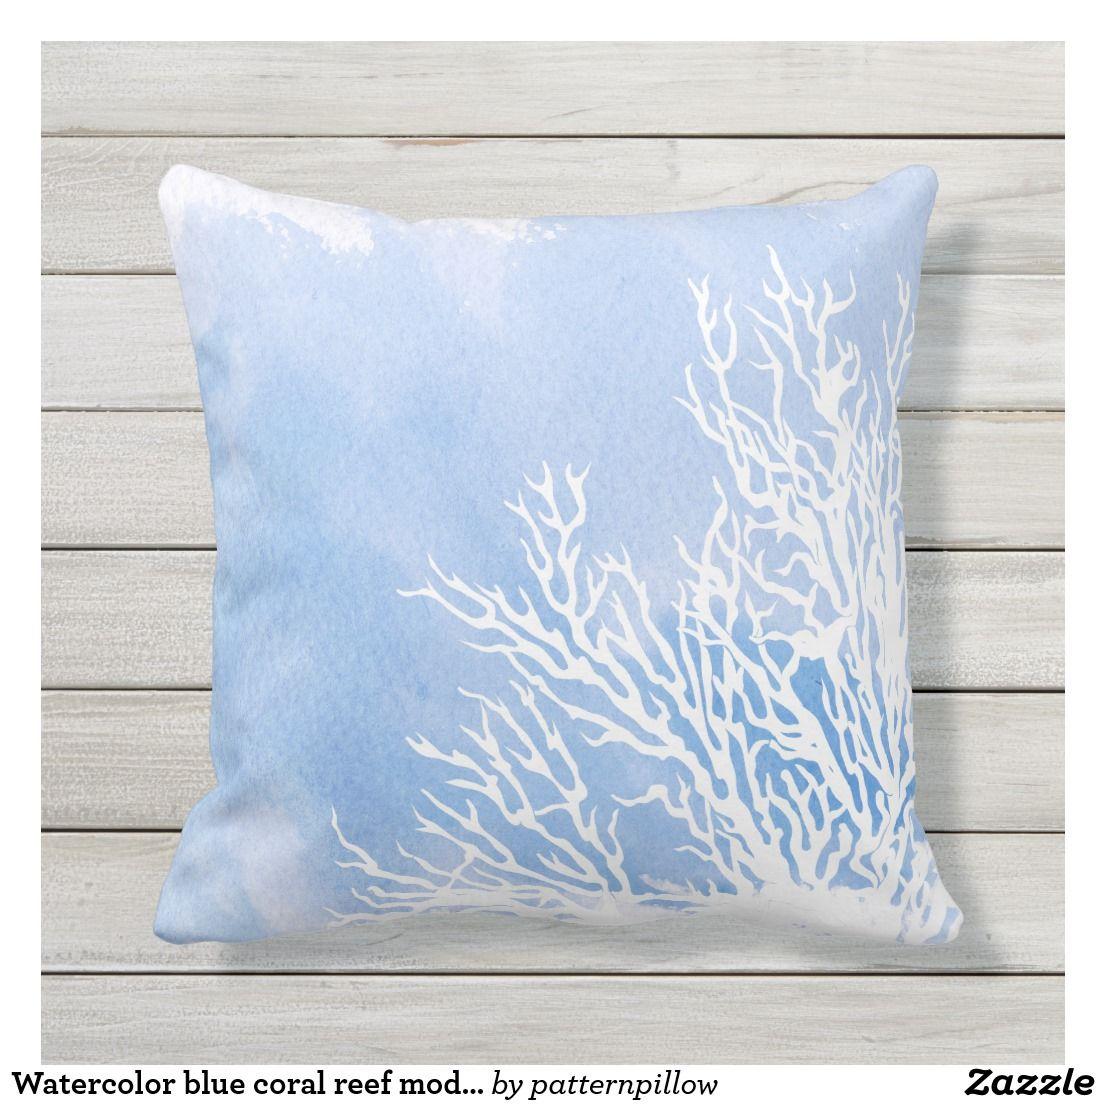 Watercolor Blue Coral Reef Modern Beach Summer Outdoor Pillow Zazzle Com Outdoor Pillows Coral Blue Summer Outdoor